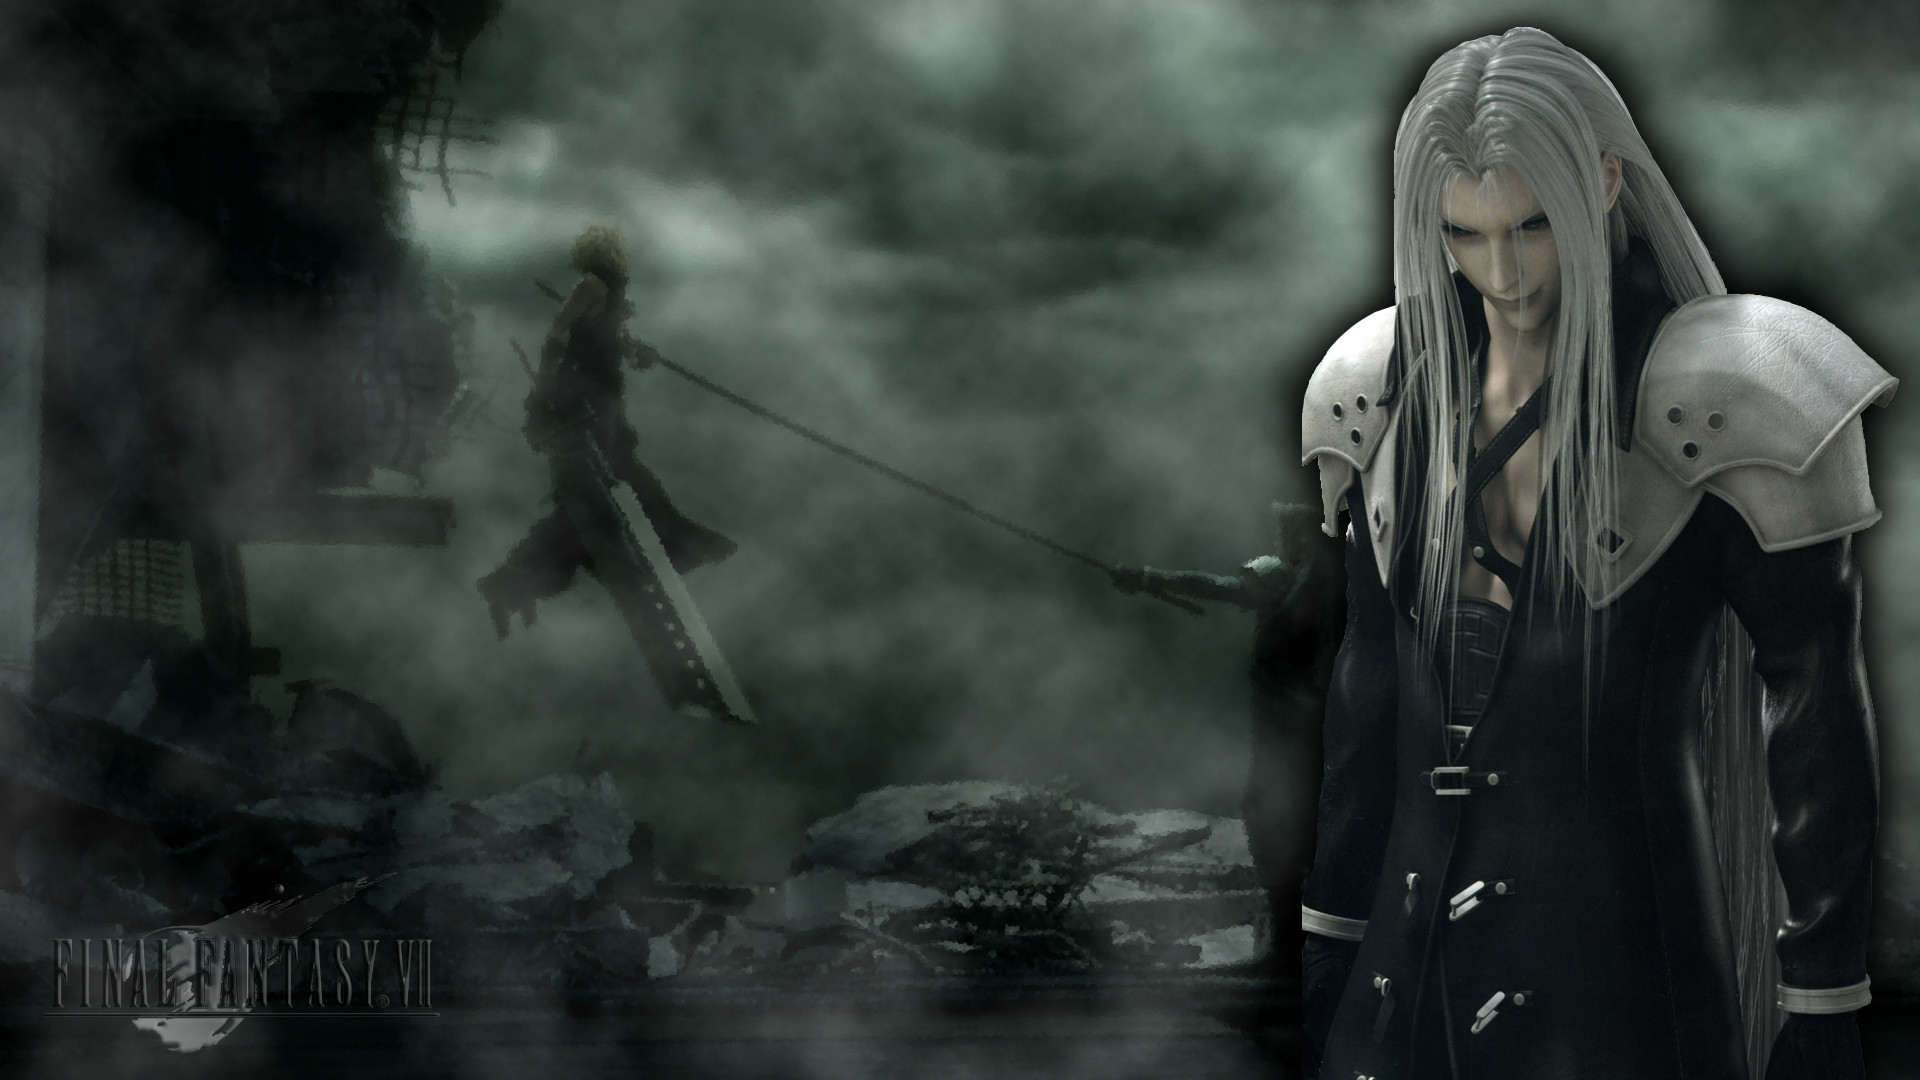 Sephiroth Wallpaper by NightmaresCalling on DeviantArt